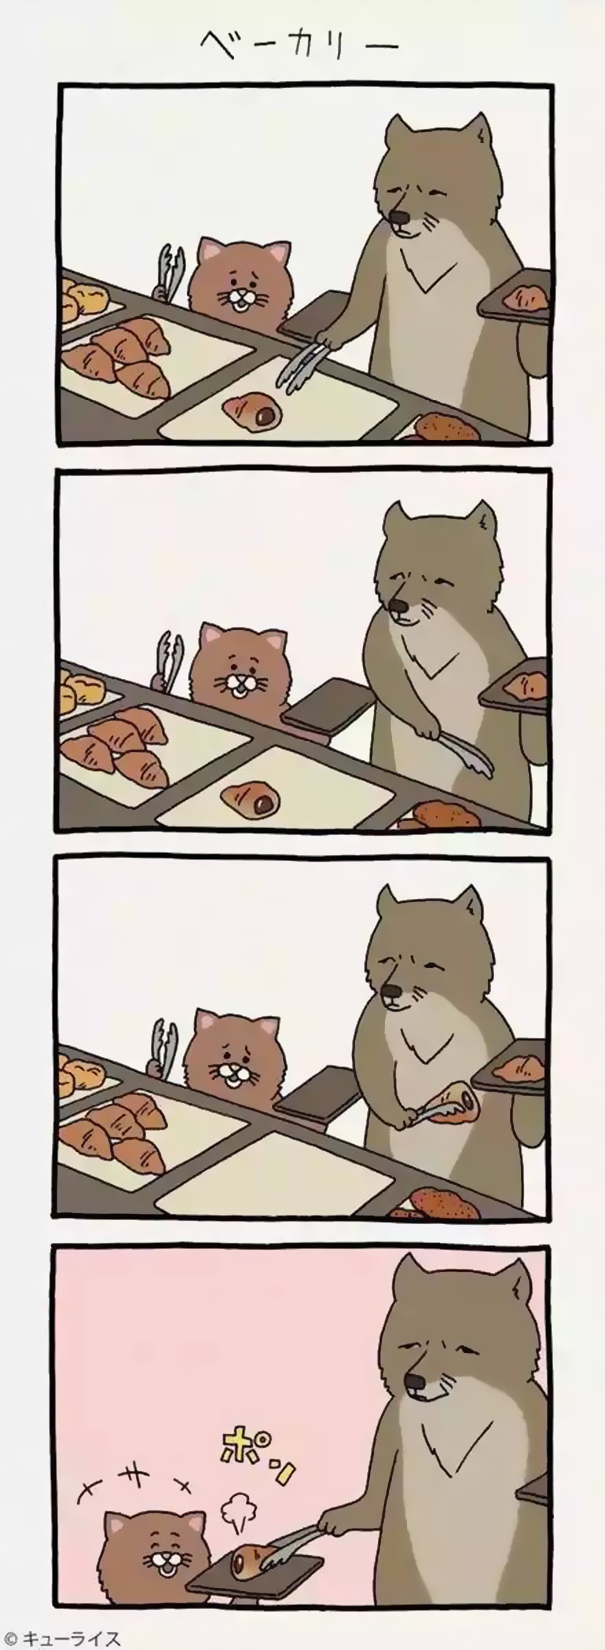 dog cartoon comics qrais japan 1 59895b1a223ad  605 - 우울한 당신을 웃게 해줄 '착한 티벳 여우' 4컷 만화